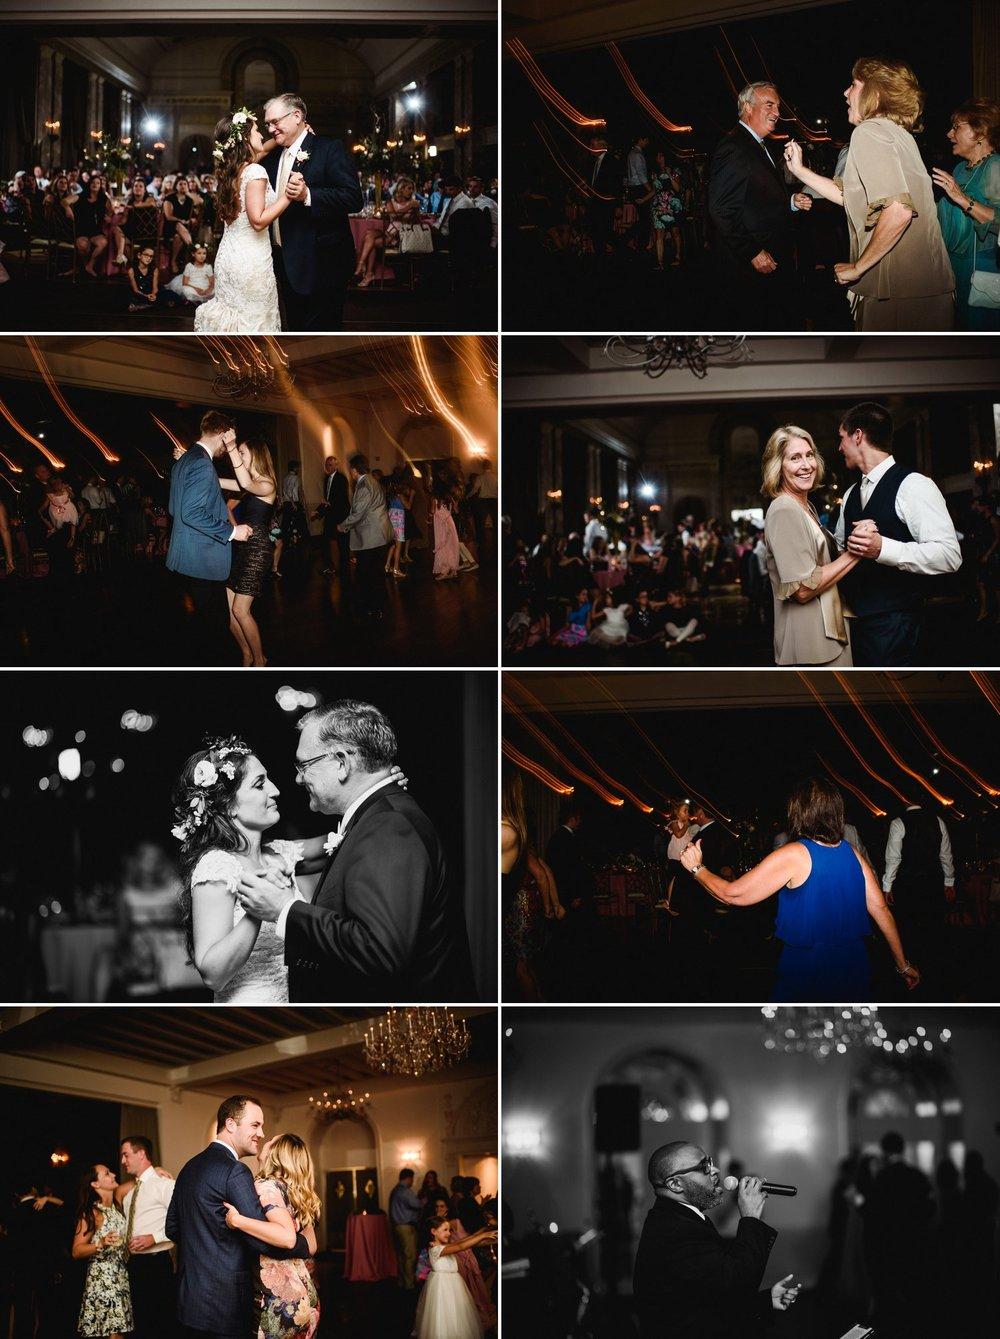 Hagan_wedding 123.jpg